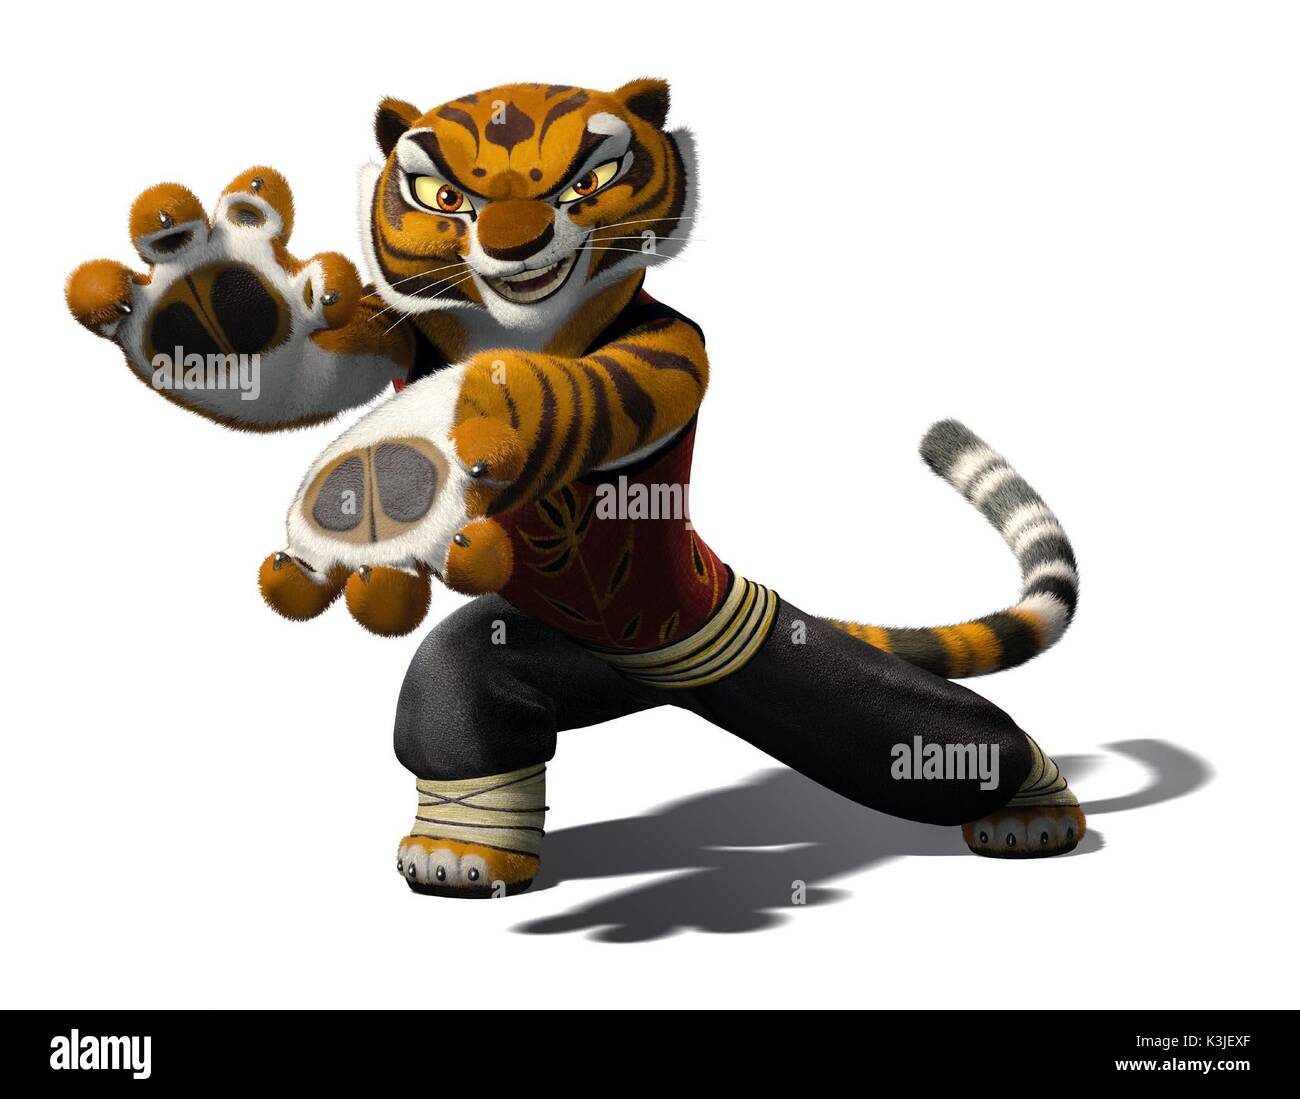 Kung Fu Panda Angelina Jolie Voices Tigress Kung Fu Panda Date Stock